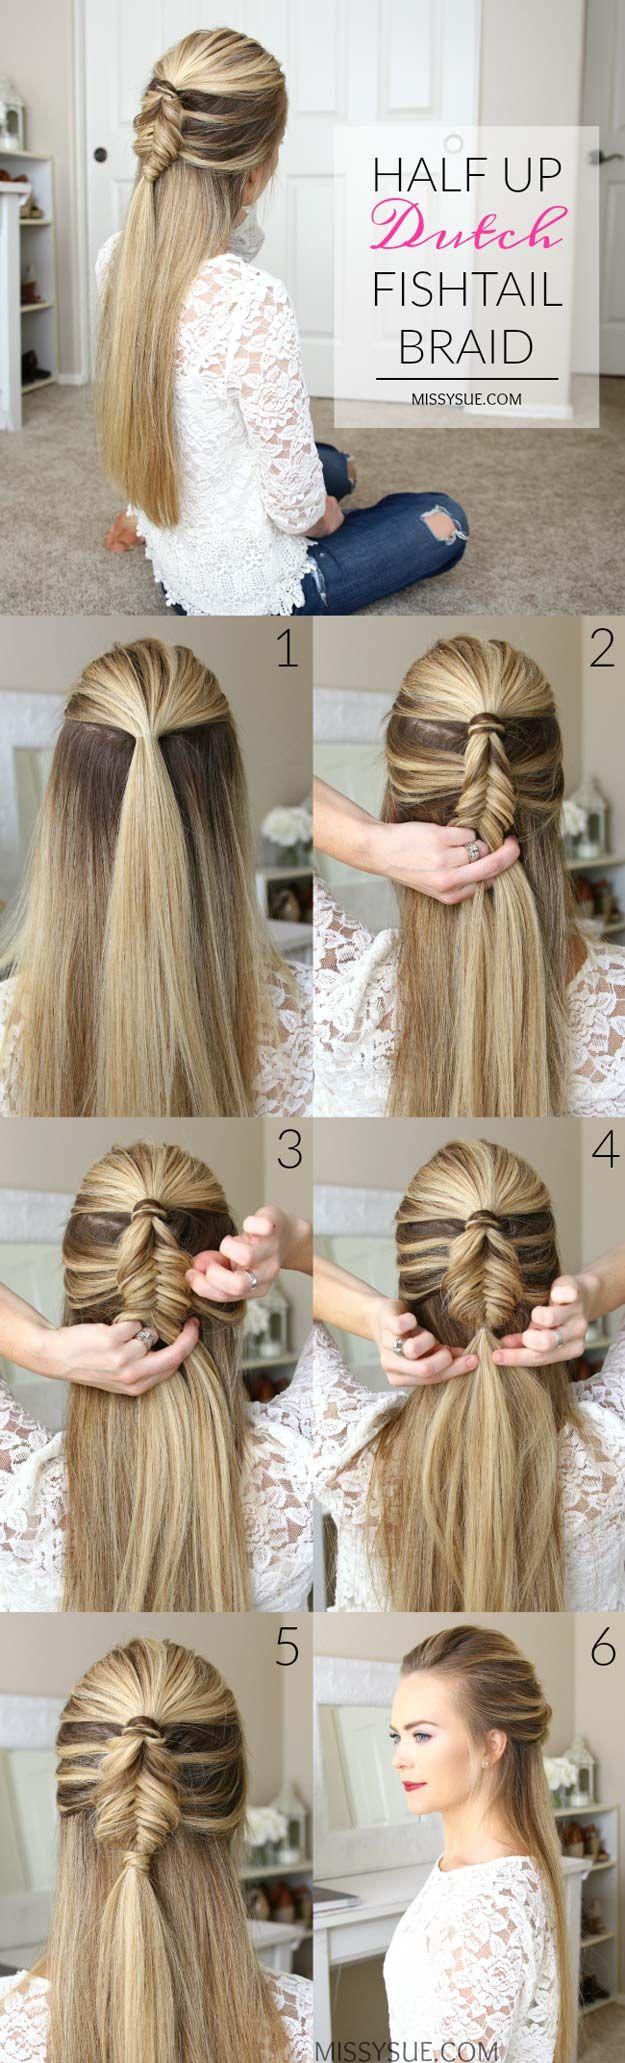 Best Hair Braiding Tutorials – Half Up Dutch Fishtail Braid – Easy Step by Step Tutorials for Braids – How To Braid Fishtail,